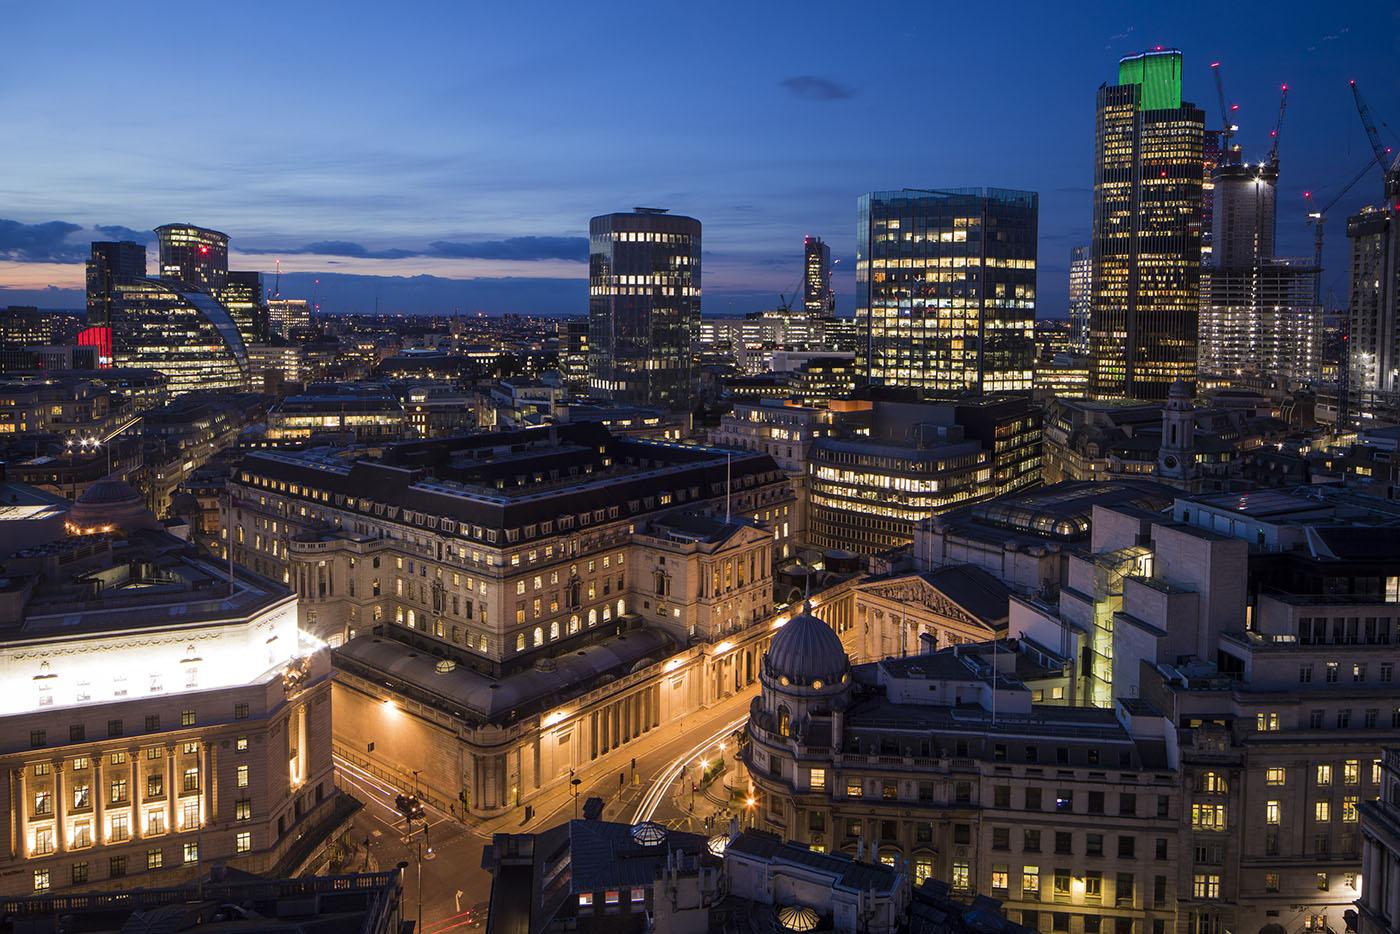 London based editorial photographer Jason Alden